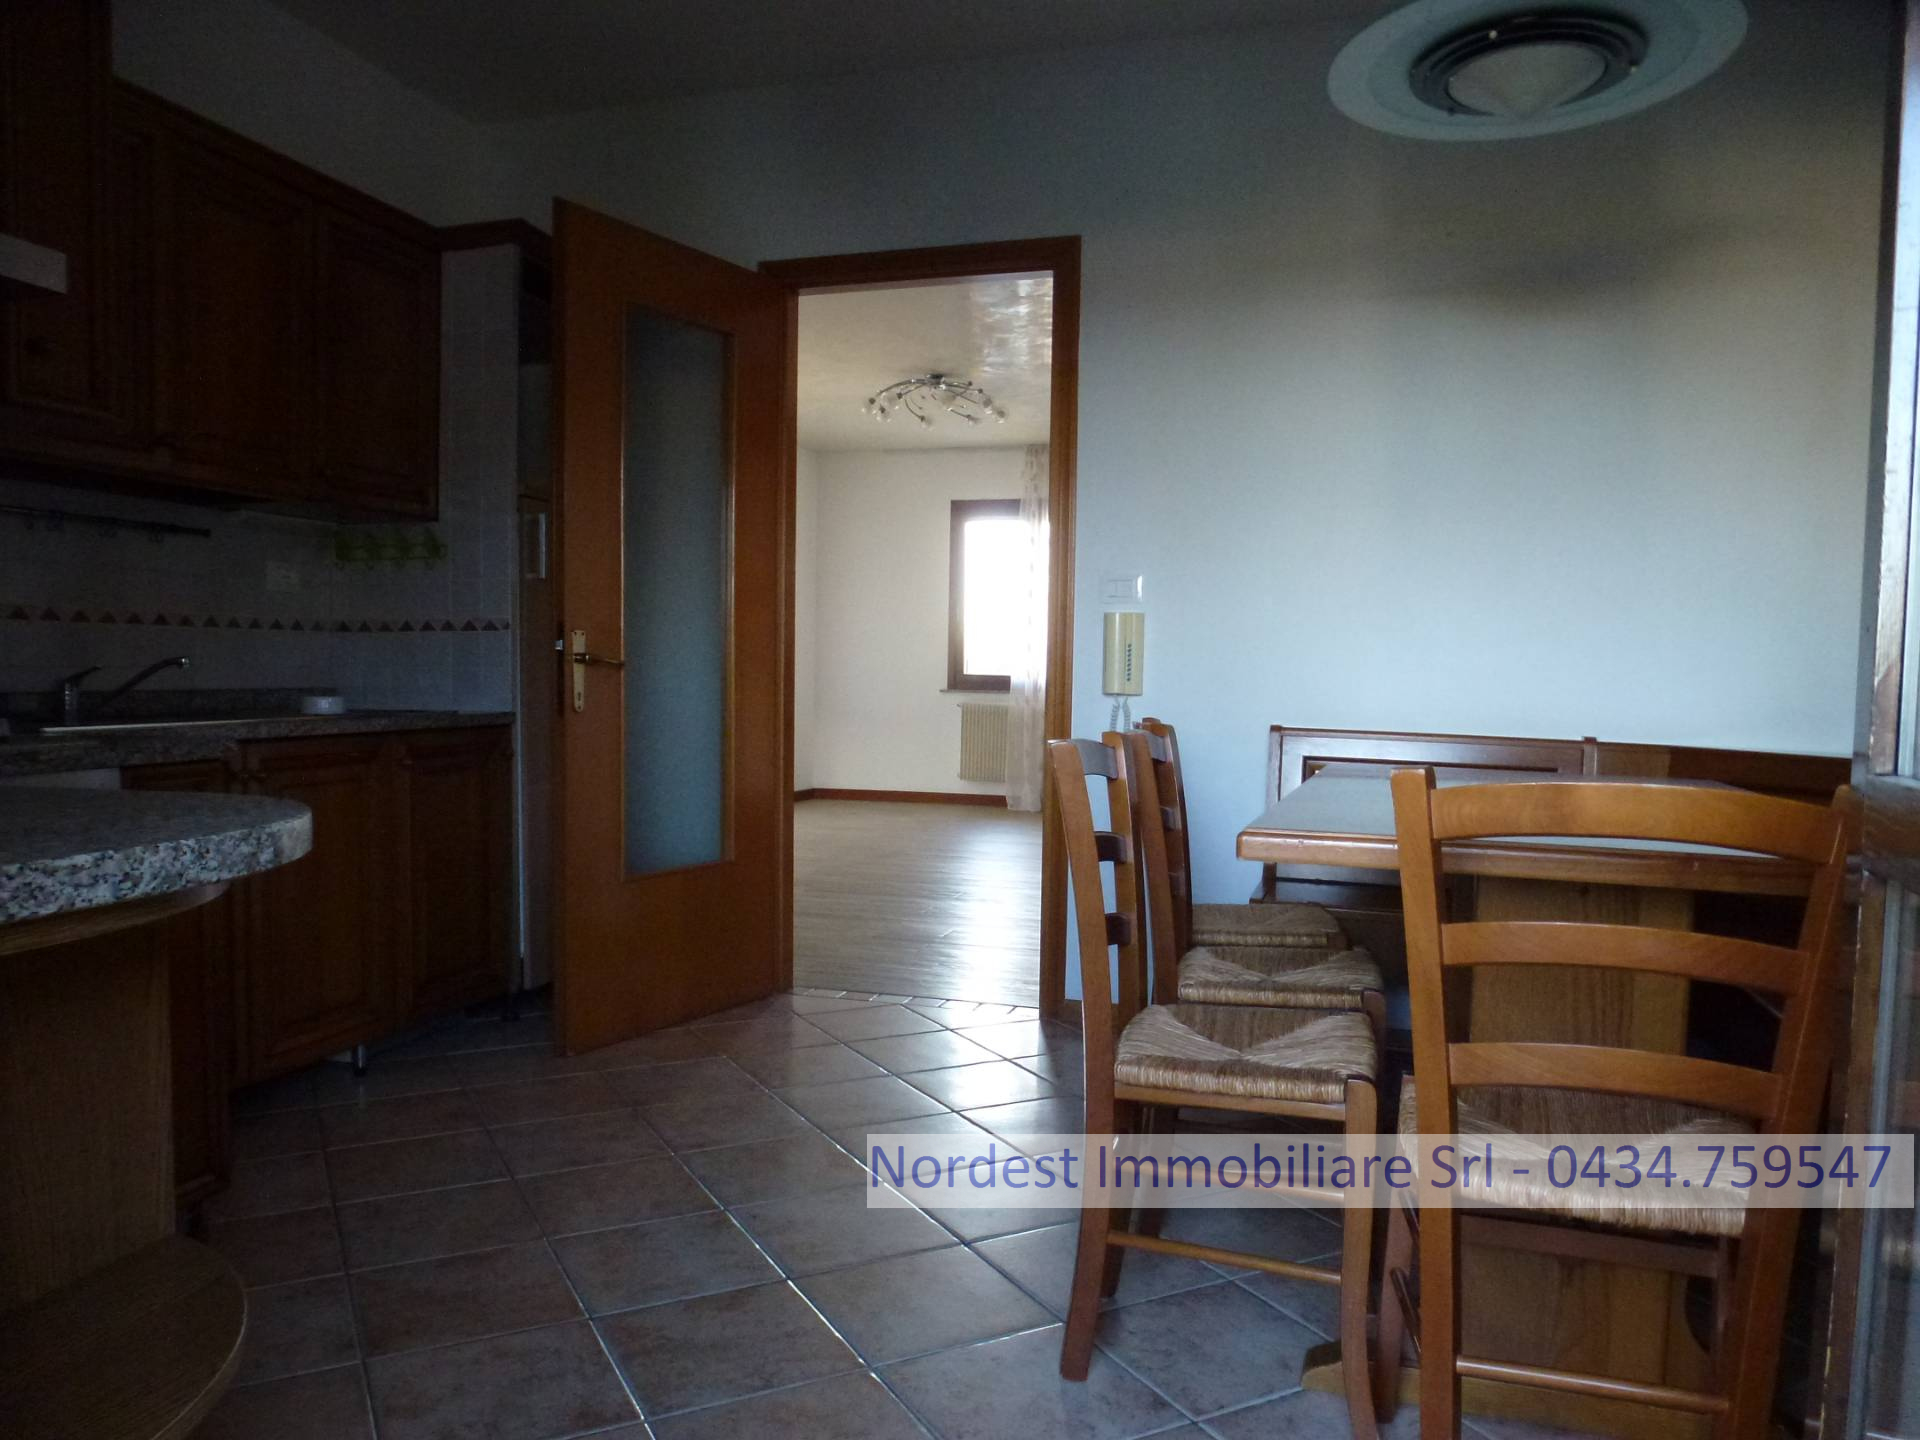 Appartamento in vendita a Gaiarine, 9999 locali, Trattative riservate | CambioCasa.it